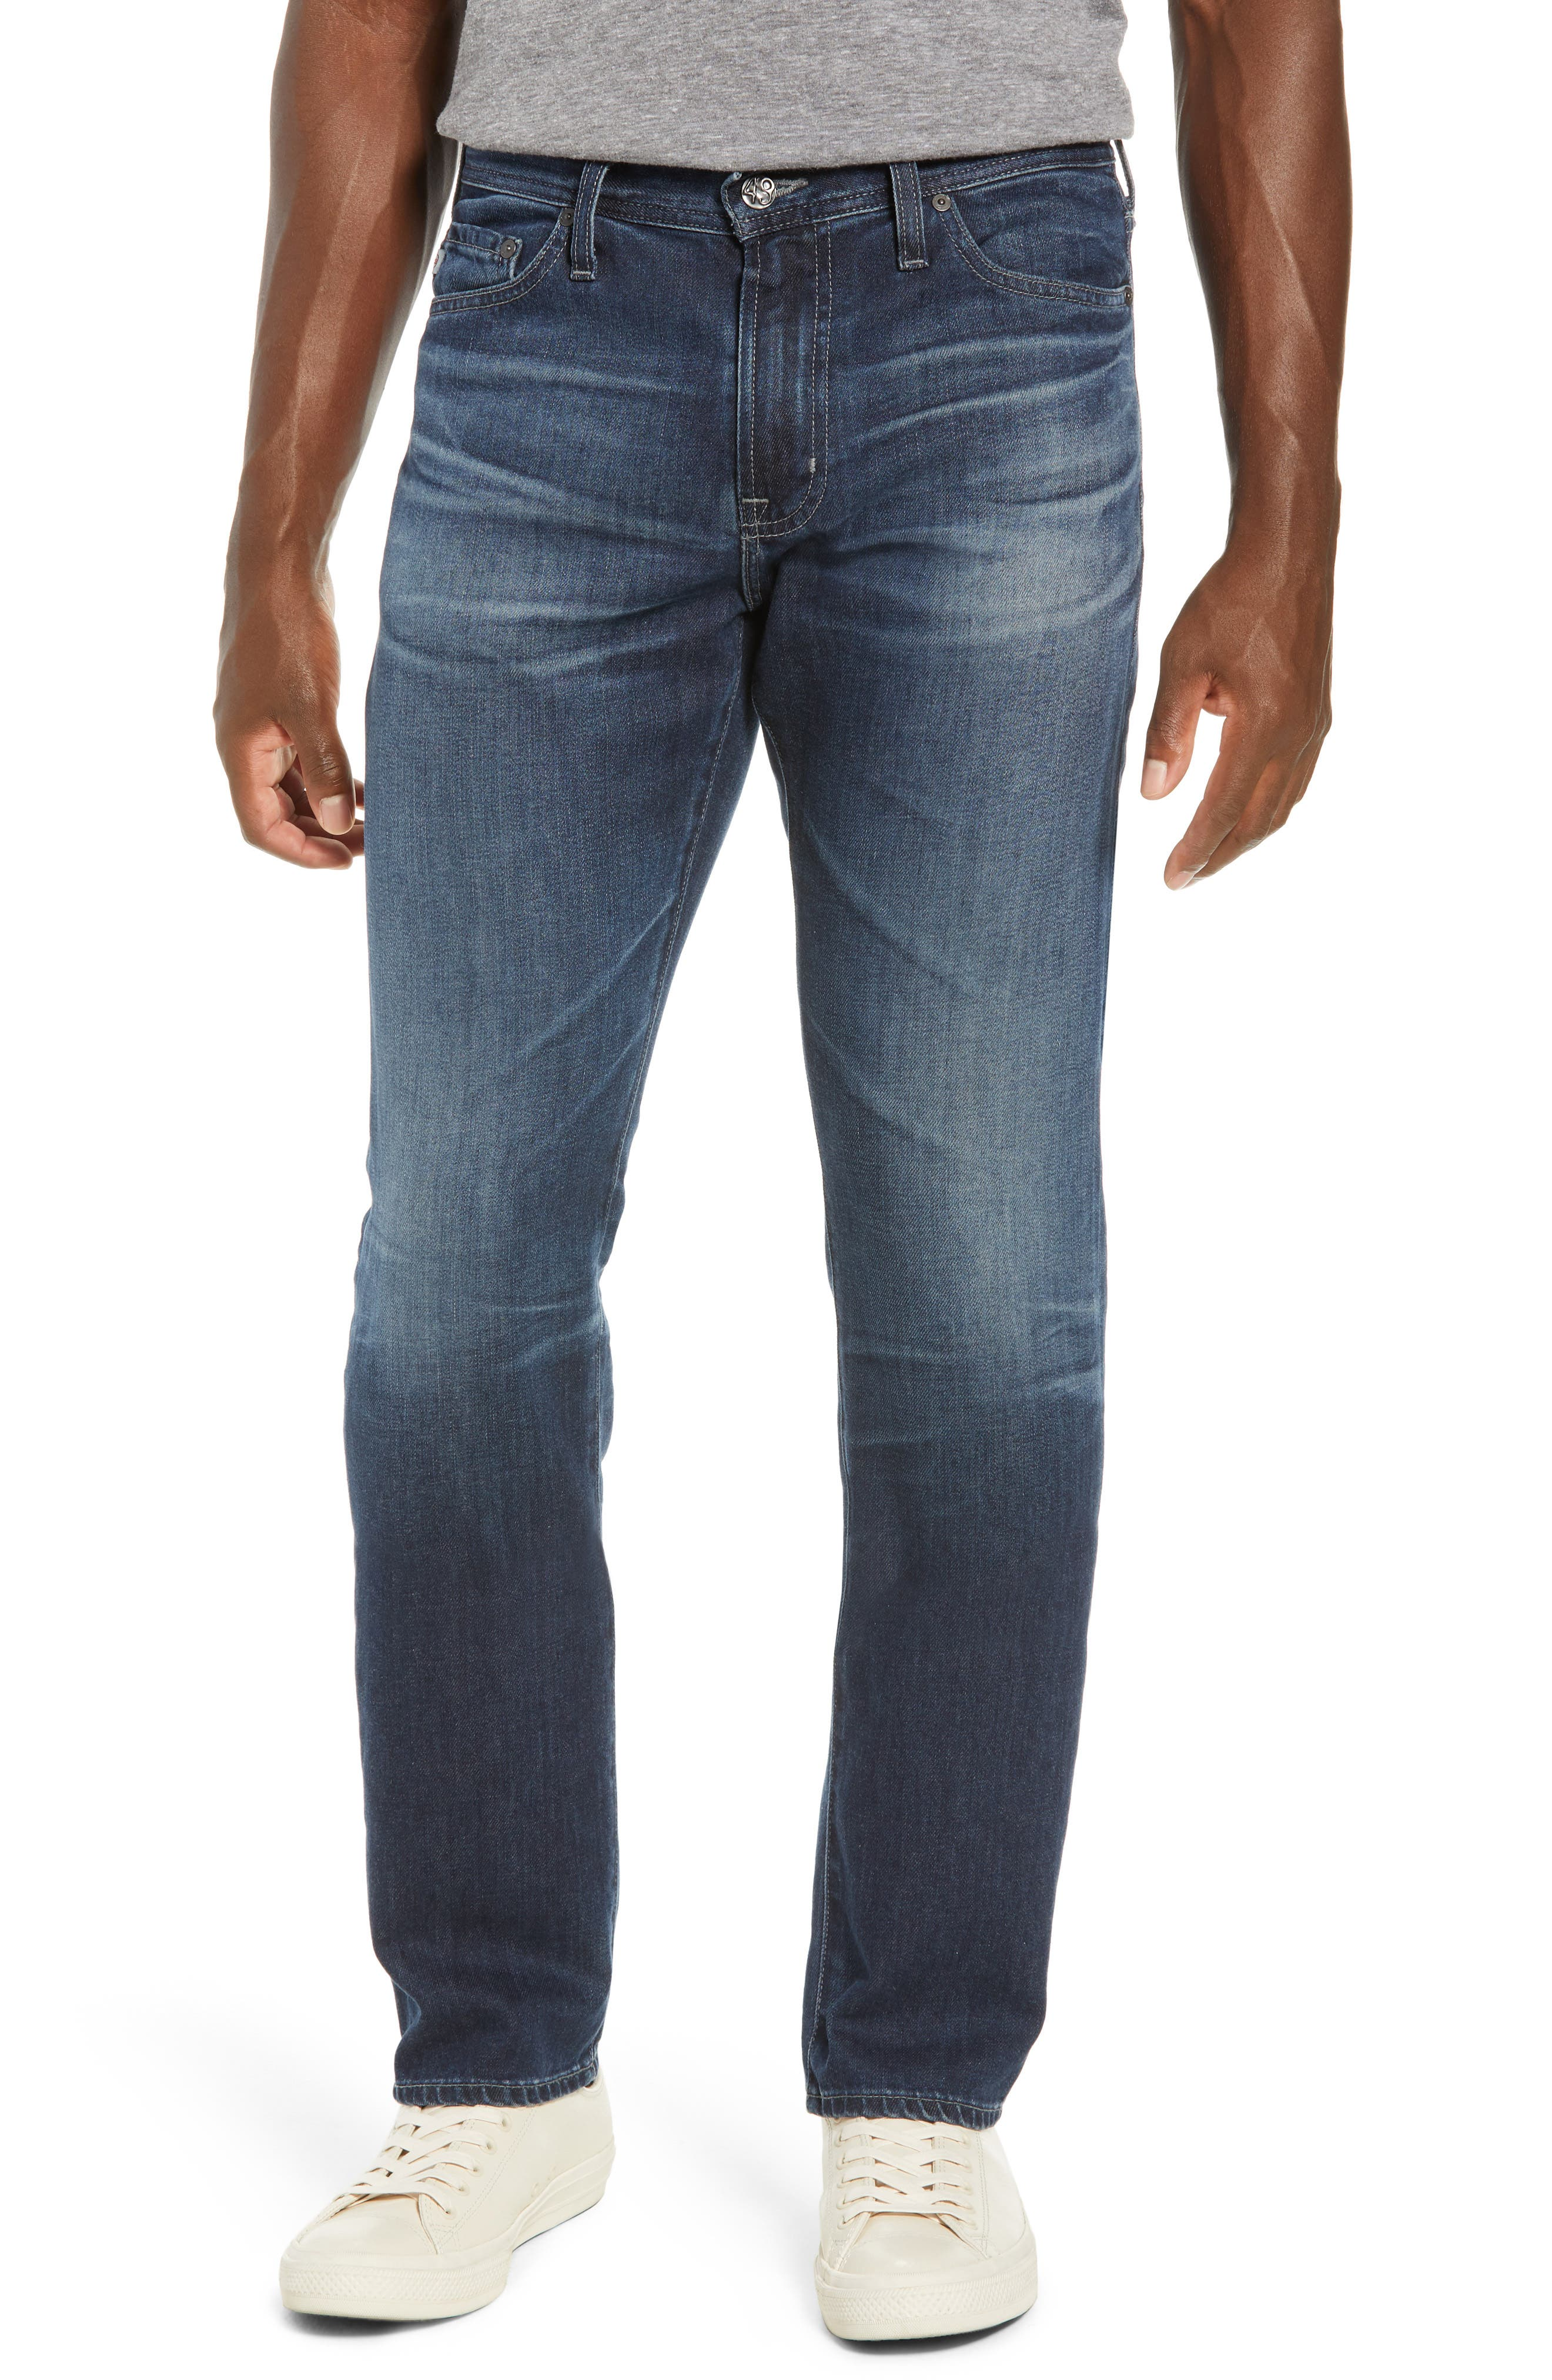 Everett Slim Straight Leg Jeans,                         Main,                         color, 7 YEARS PARK AVEUNE